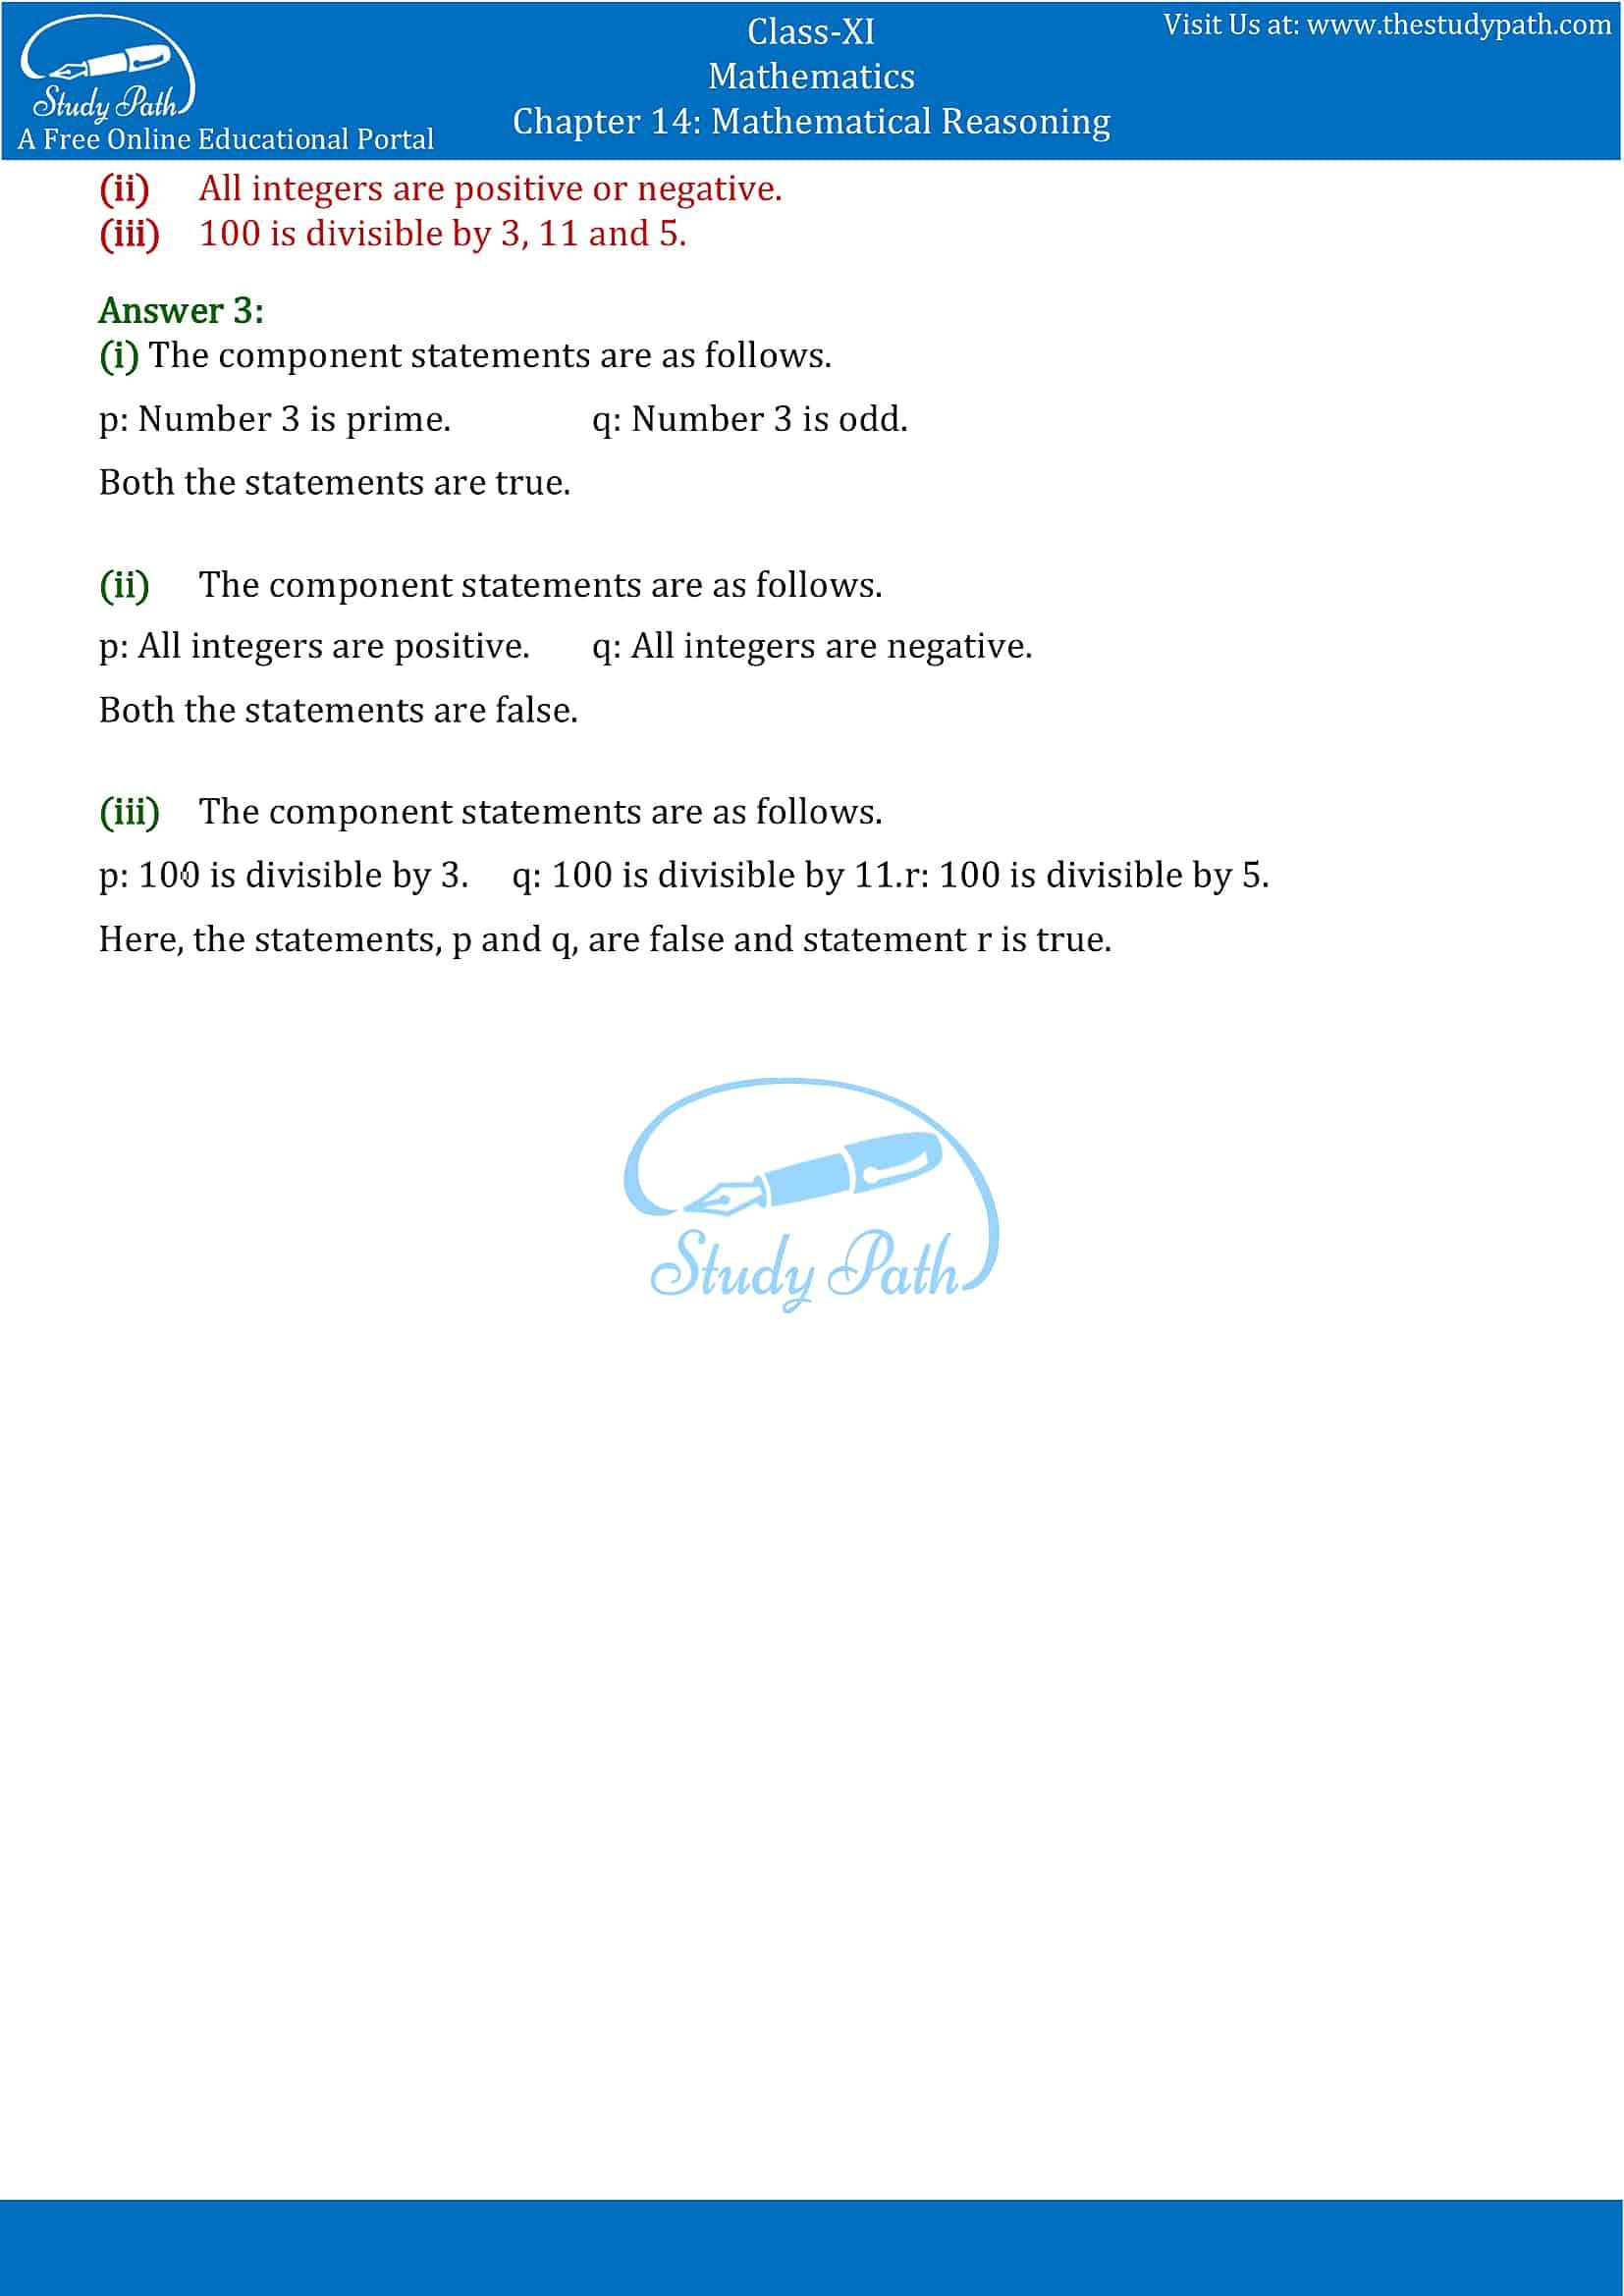 NCERT Solutions for Class 11 Maths Chapter 14 Mathematical Reasoning Part 4